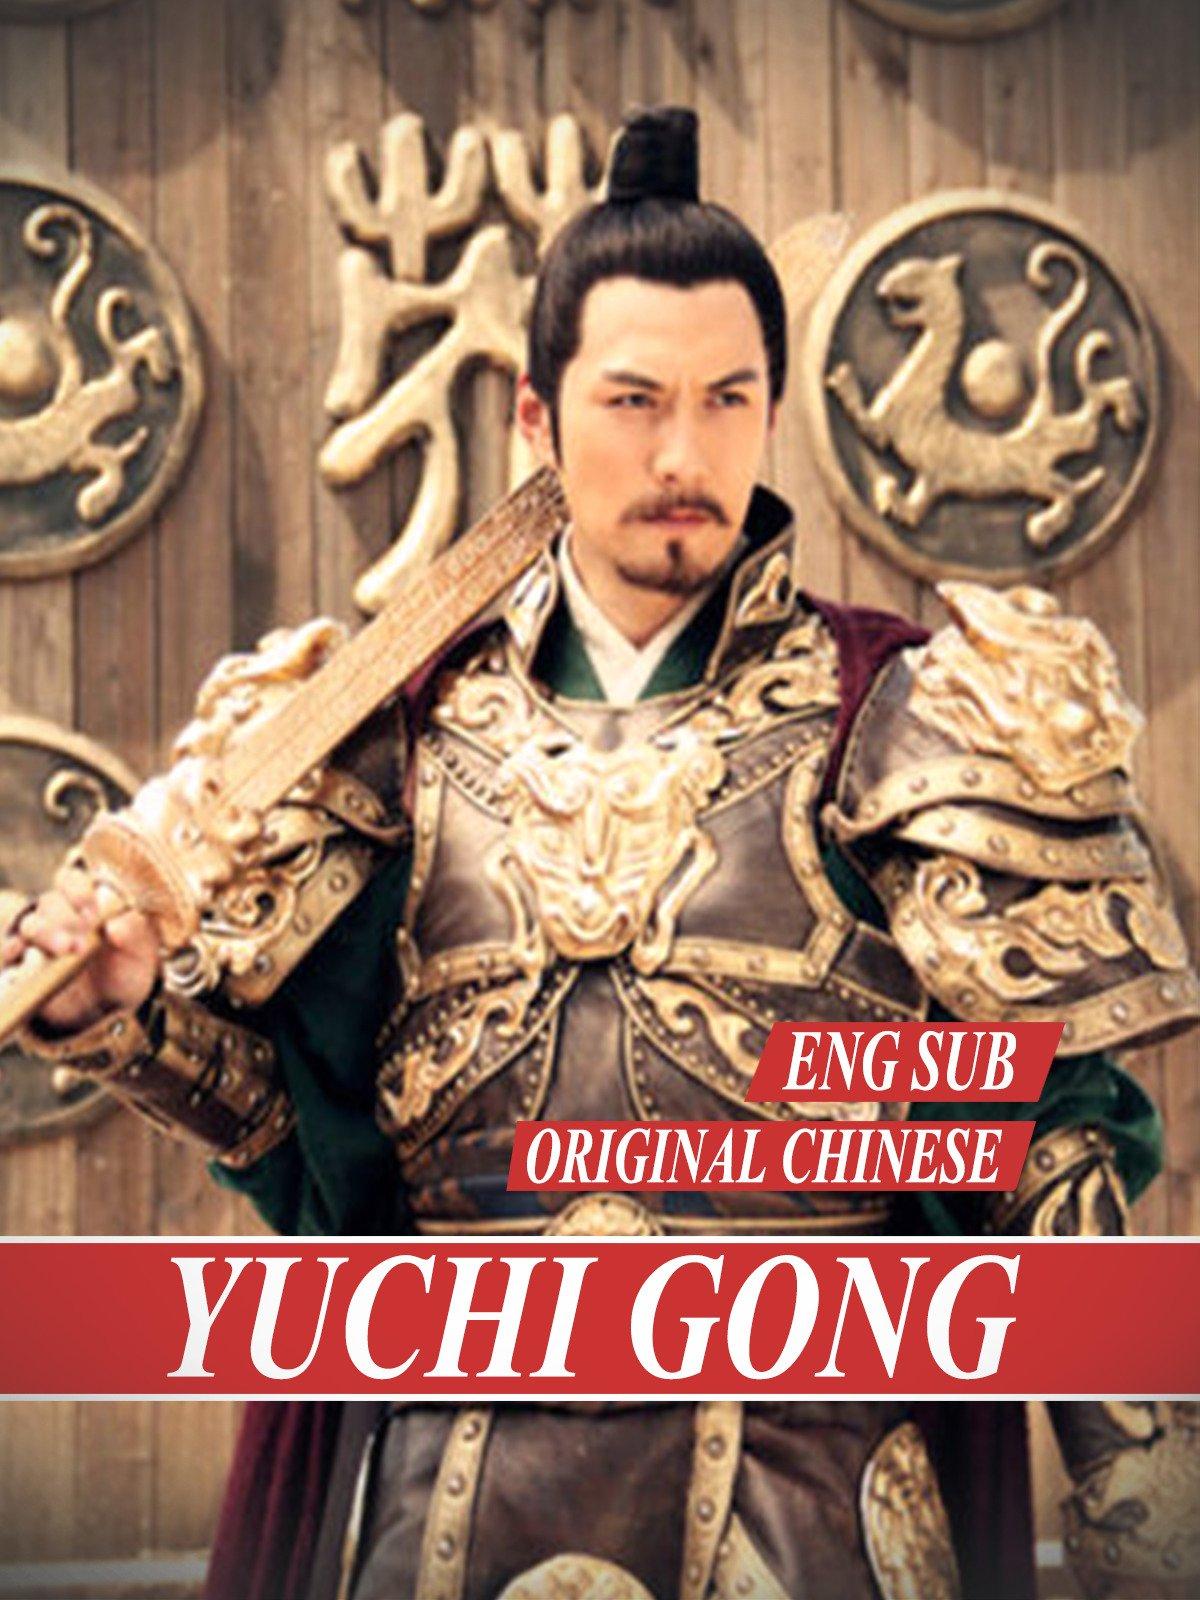 Yuchi Gоng [Eng Sub] original Chinese